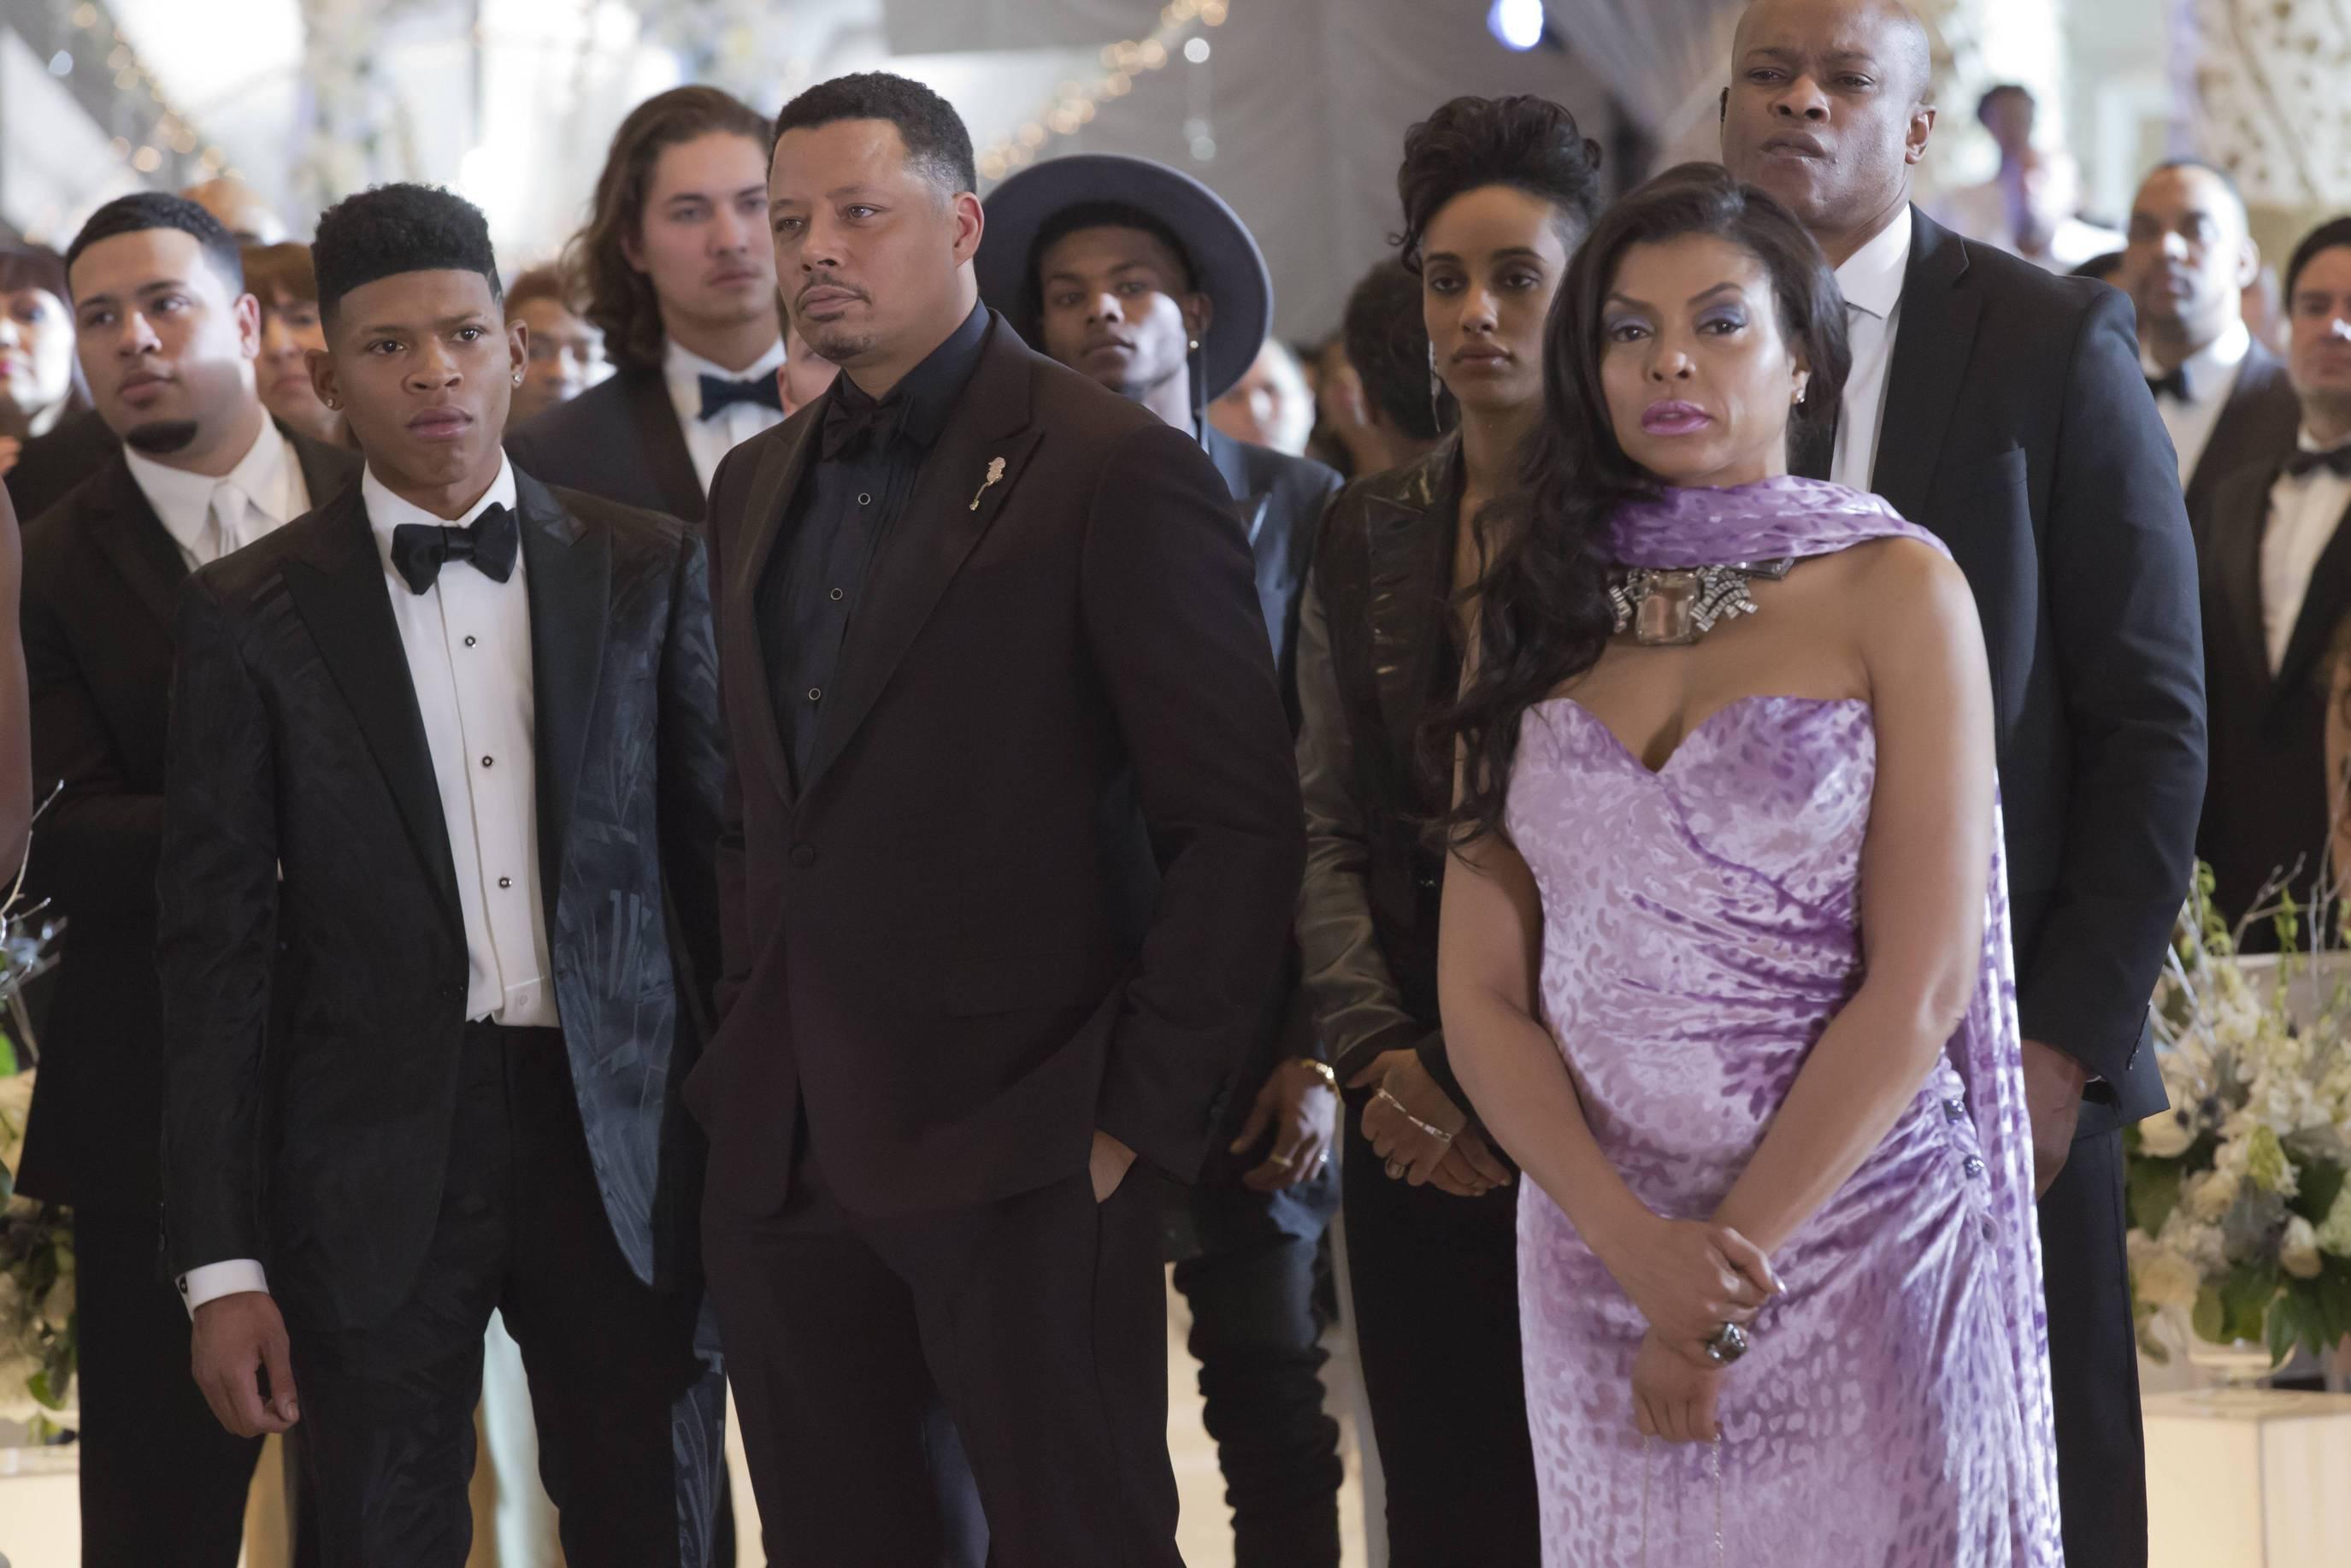 Unexpected Wedding and Possible Lyon Death — Empire' Finale Recap